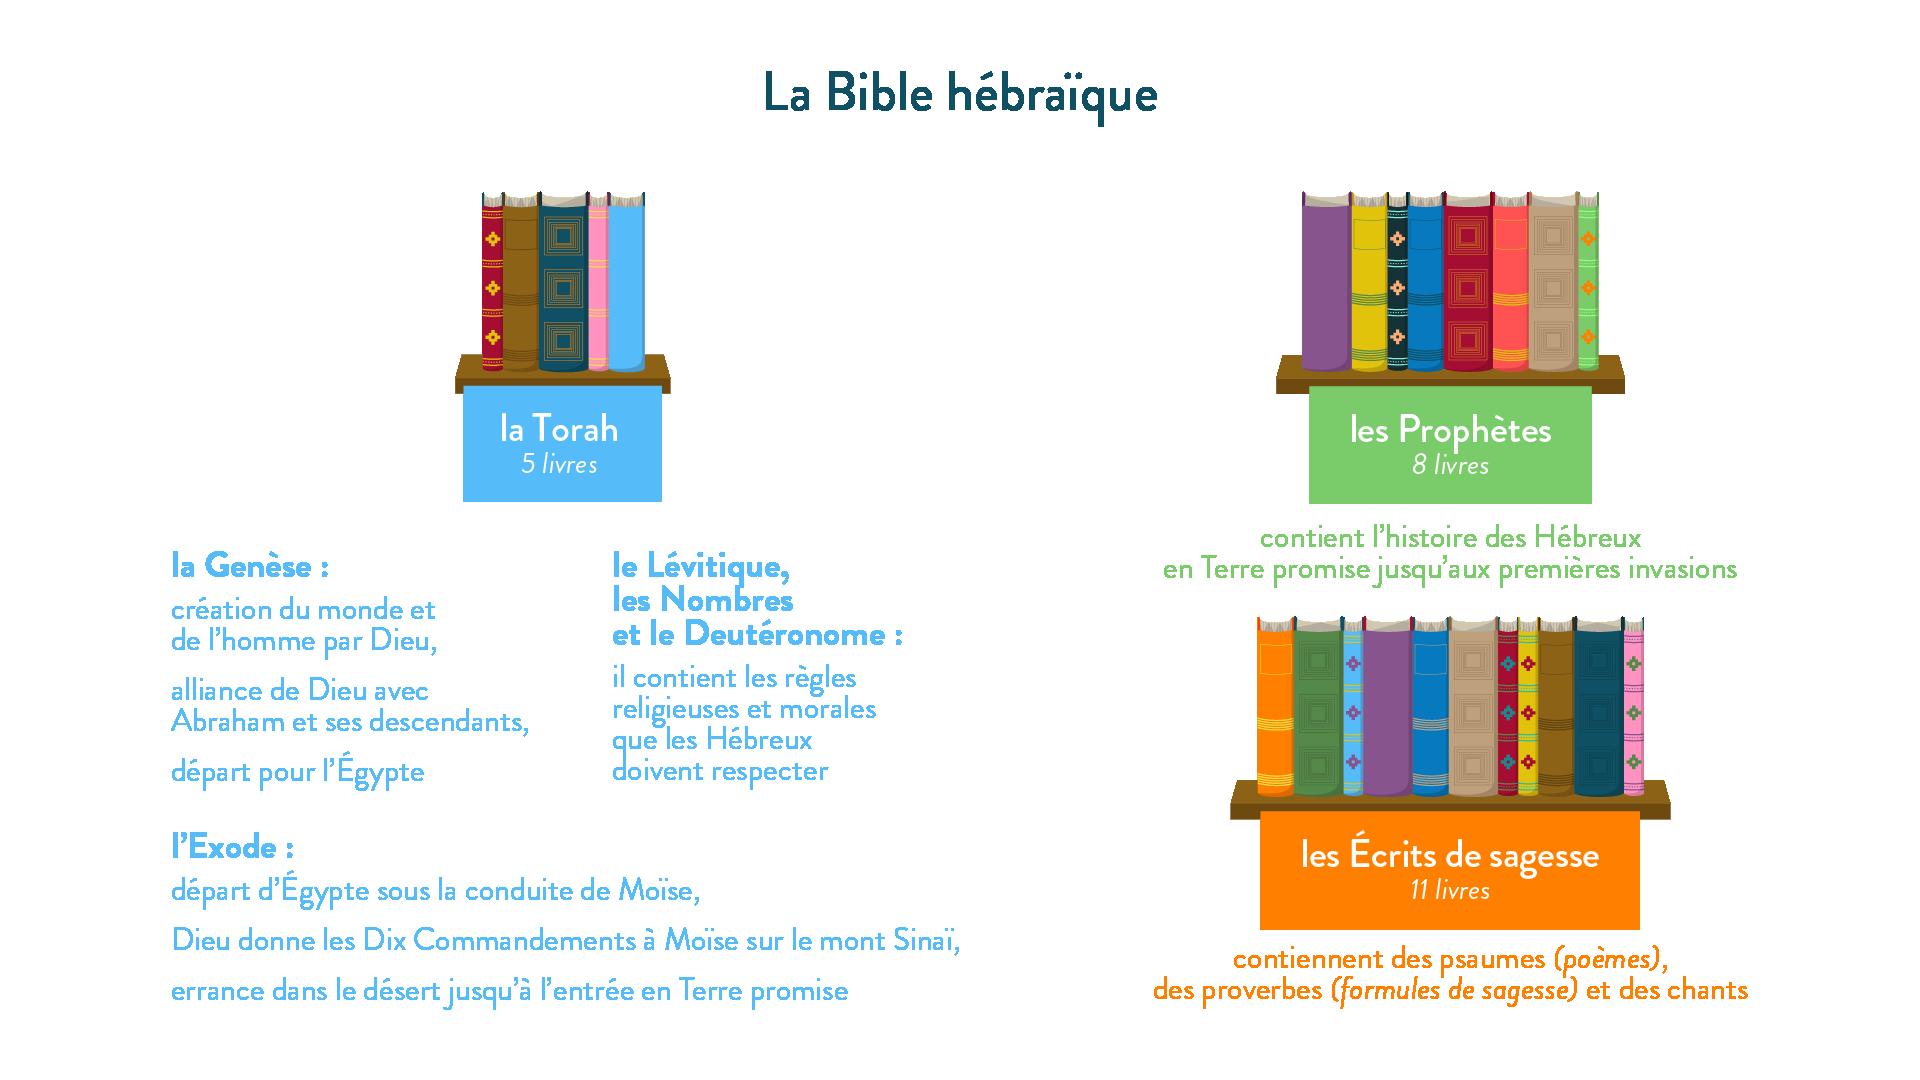 La Bible hébraïque-histoire-6e